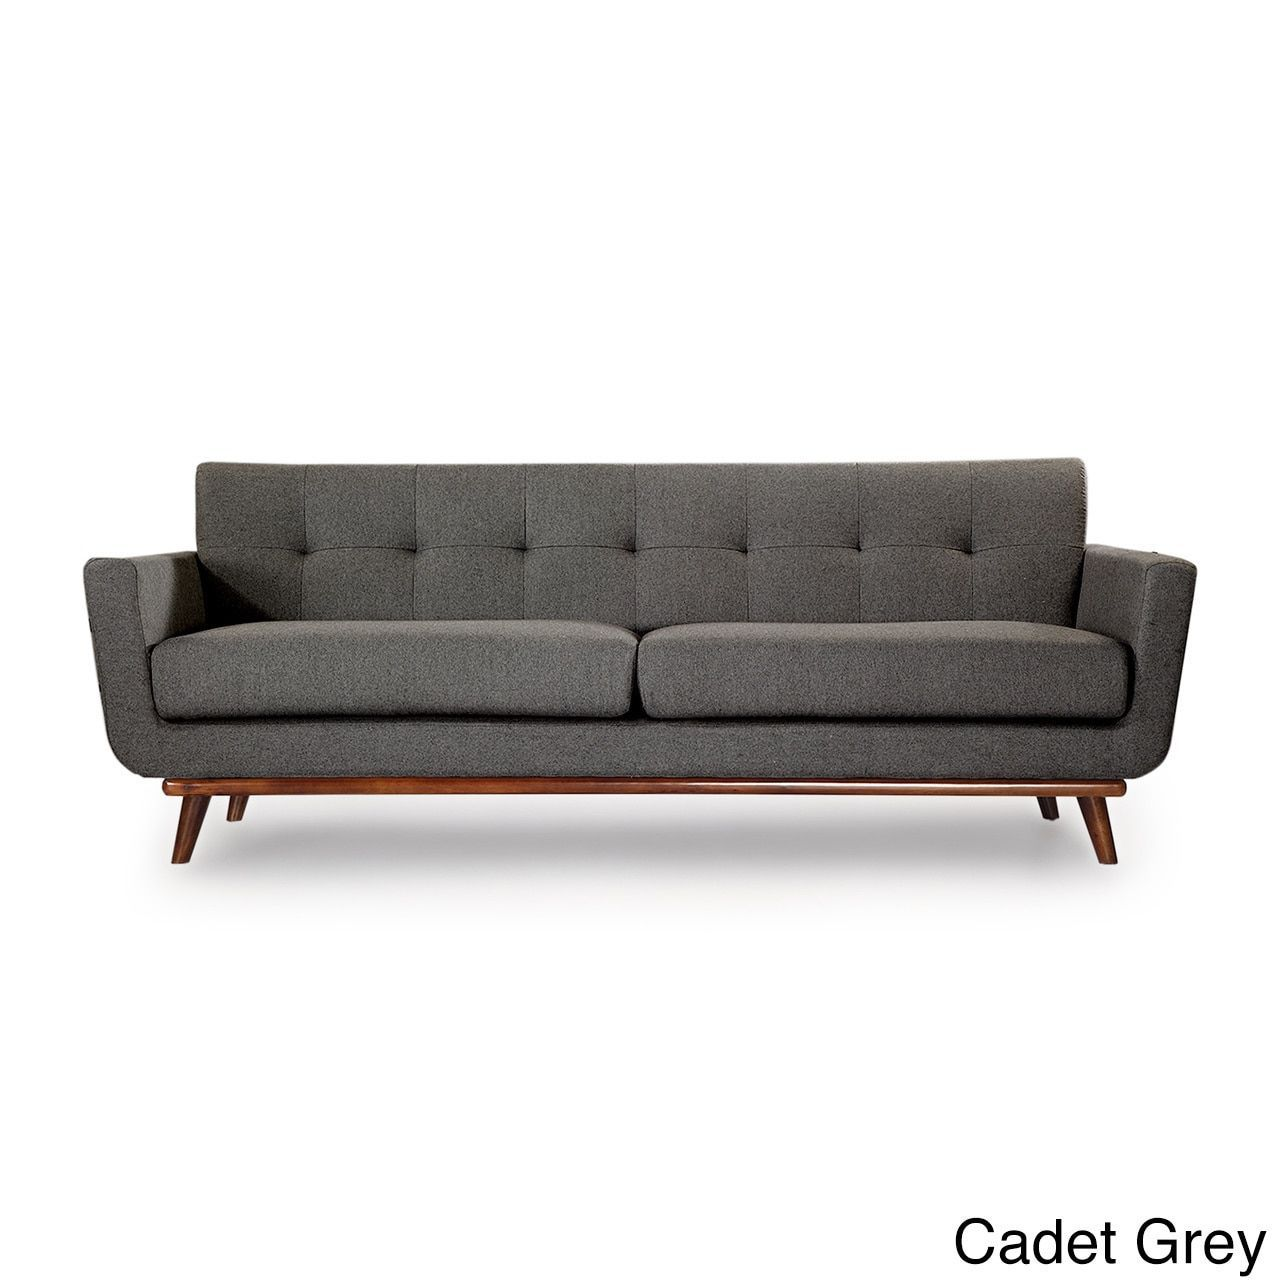 carson carrington namsos mid century modern cashmere tweed classic rh pinterest com